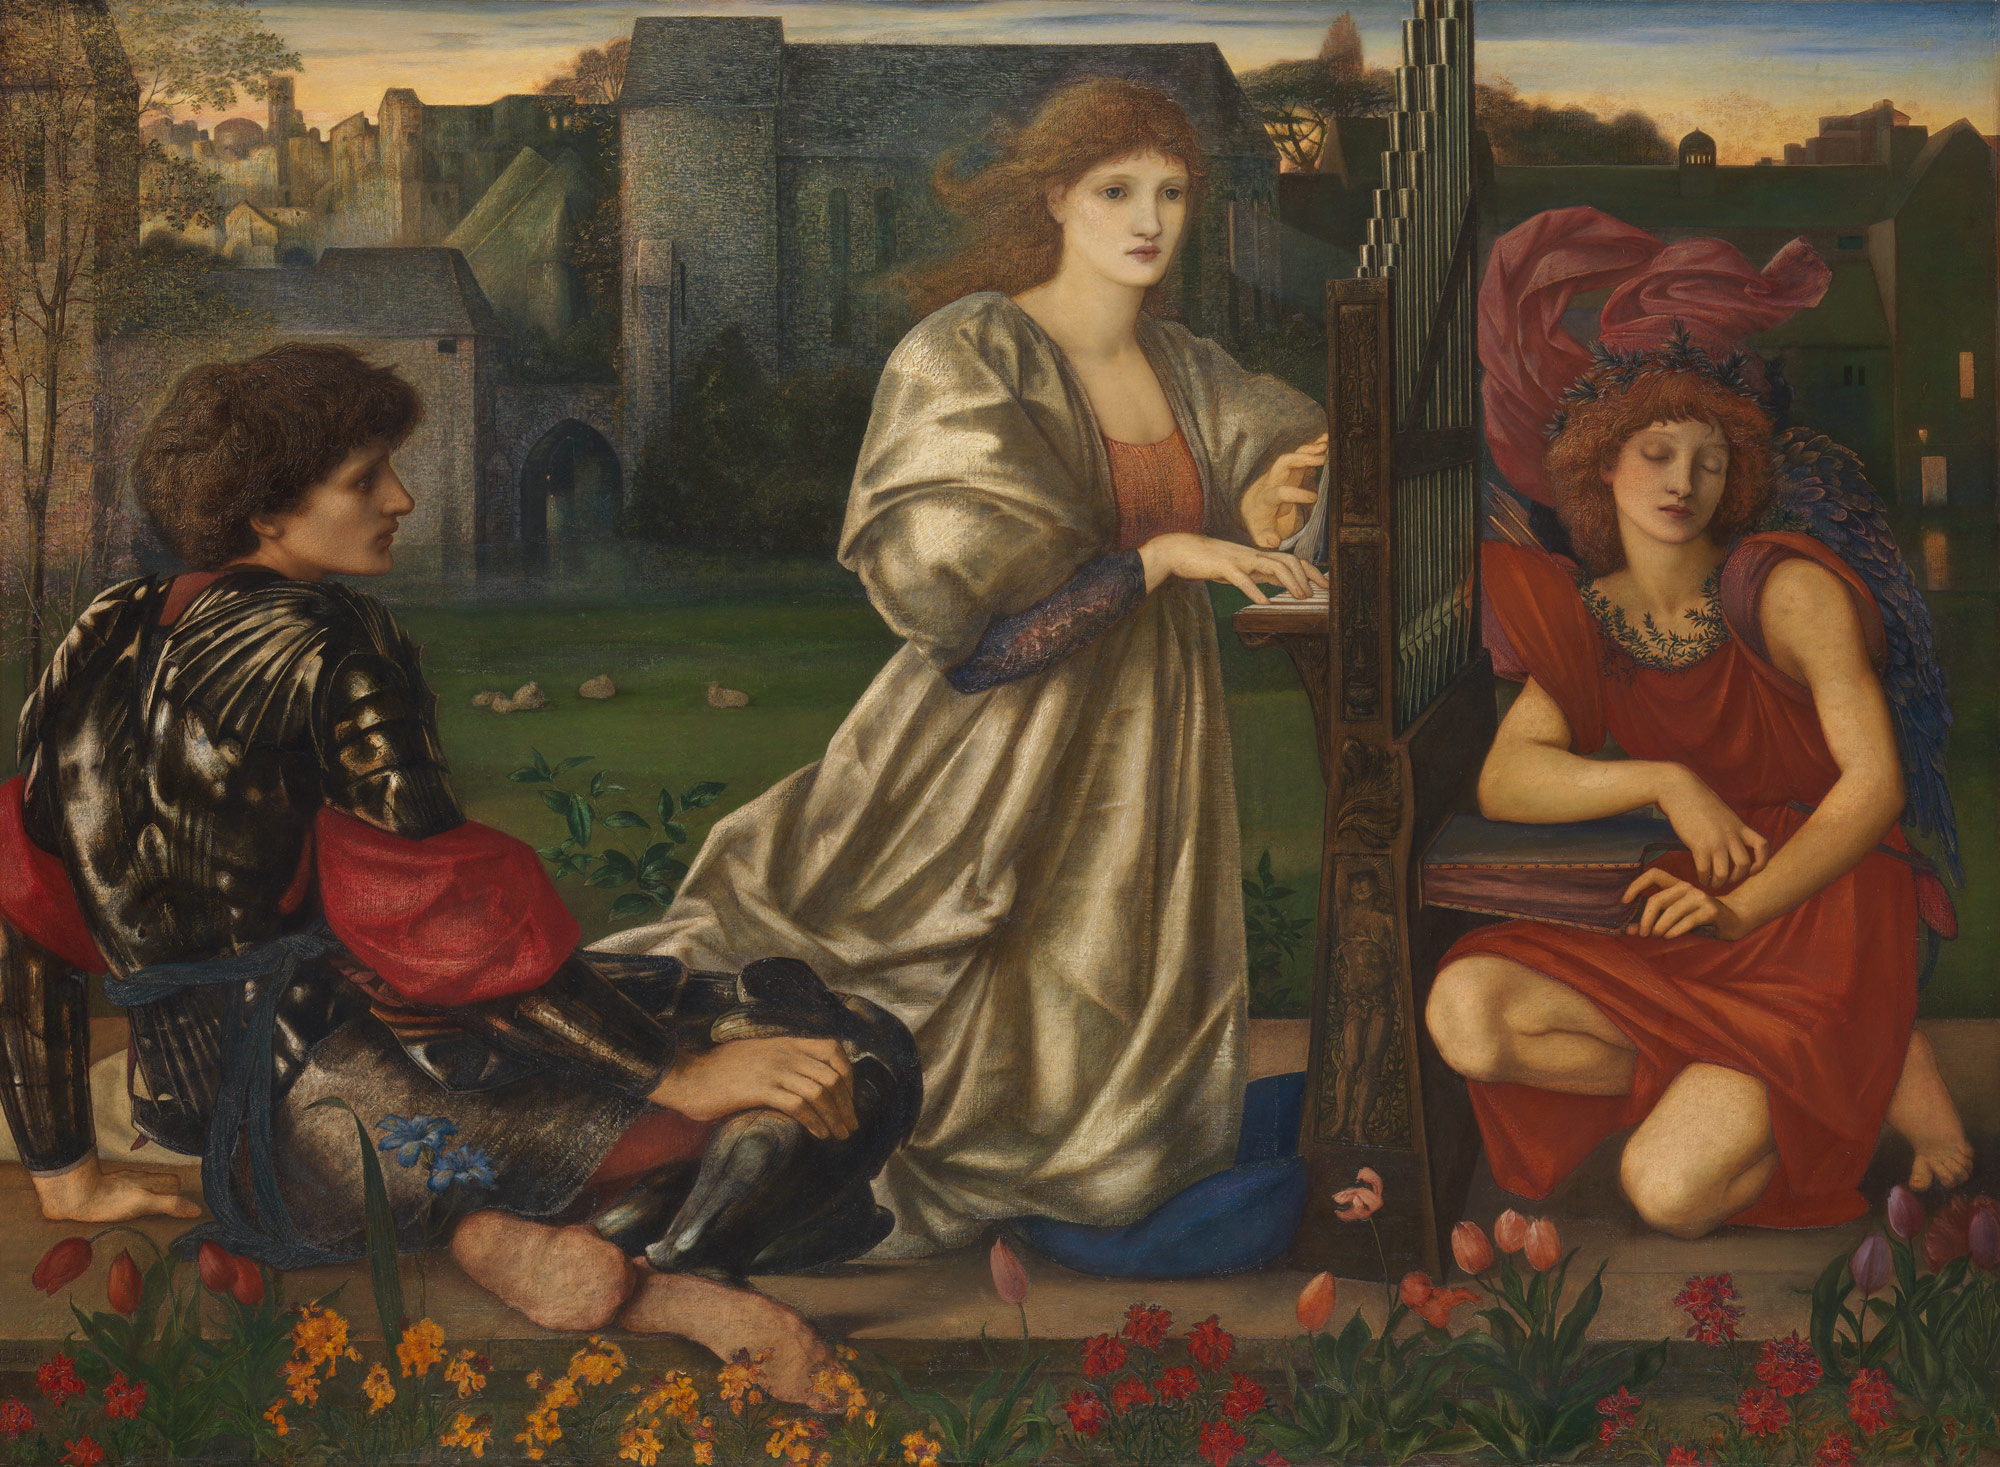 http://www.metmuseum.org/toah/images/hb/hb_47.26.jpg